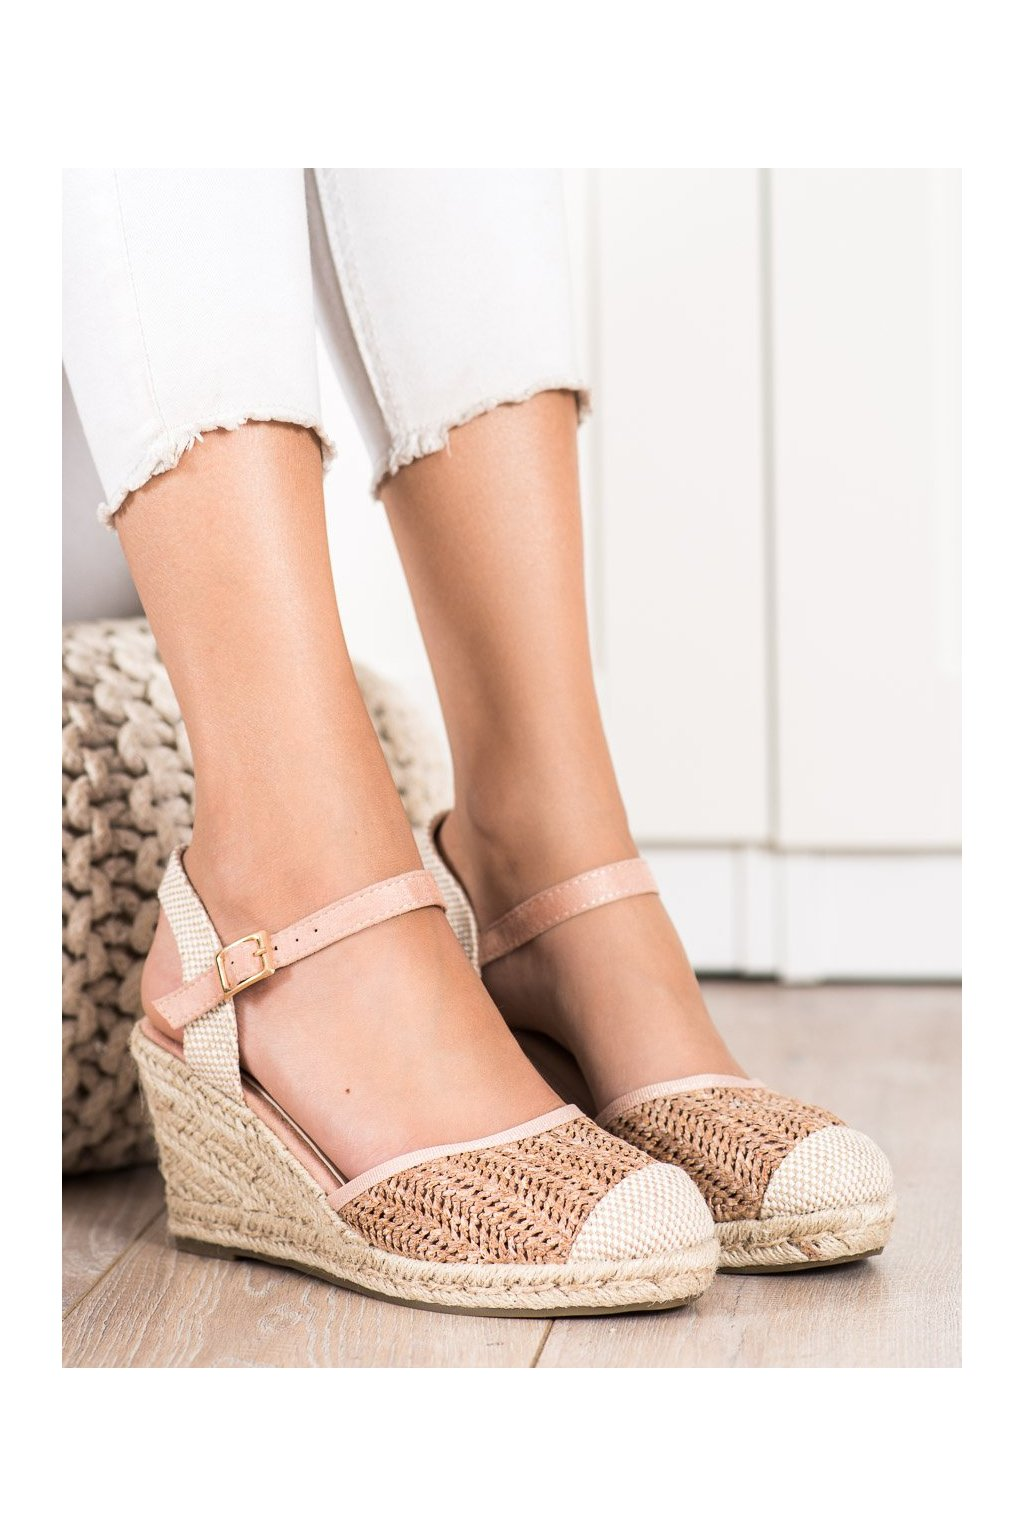 Ružové dámske sandále Sweet shoes kod DZ8006P